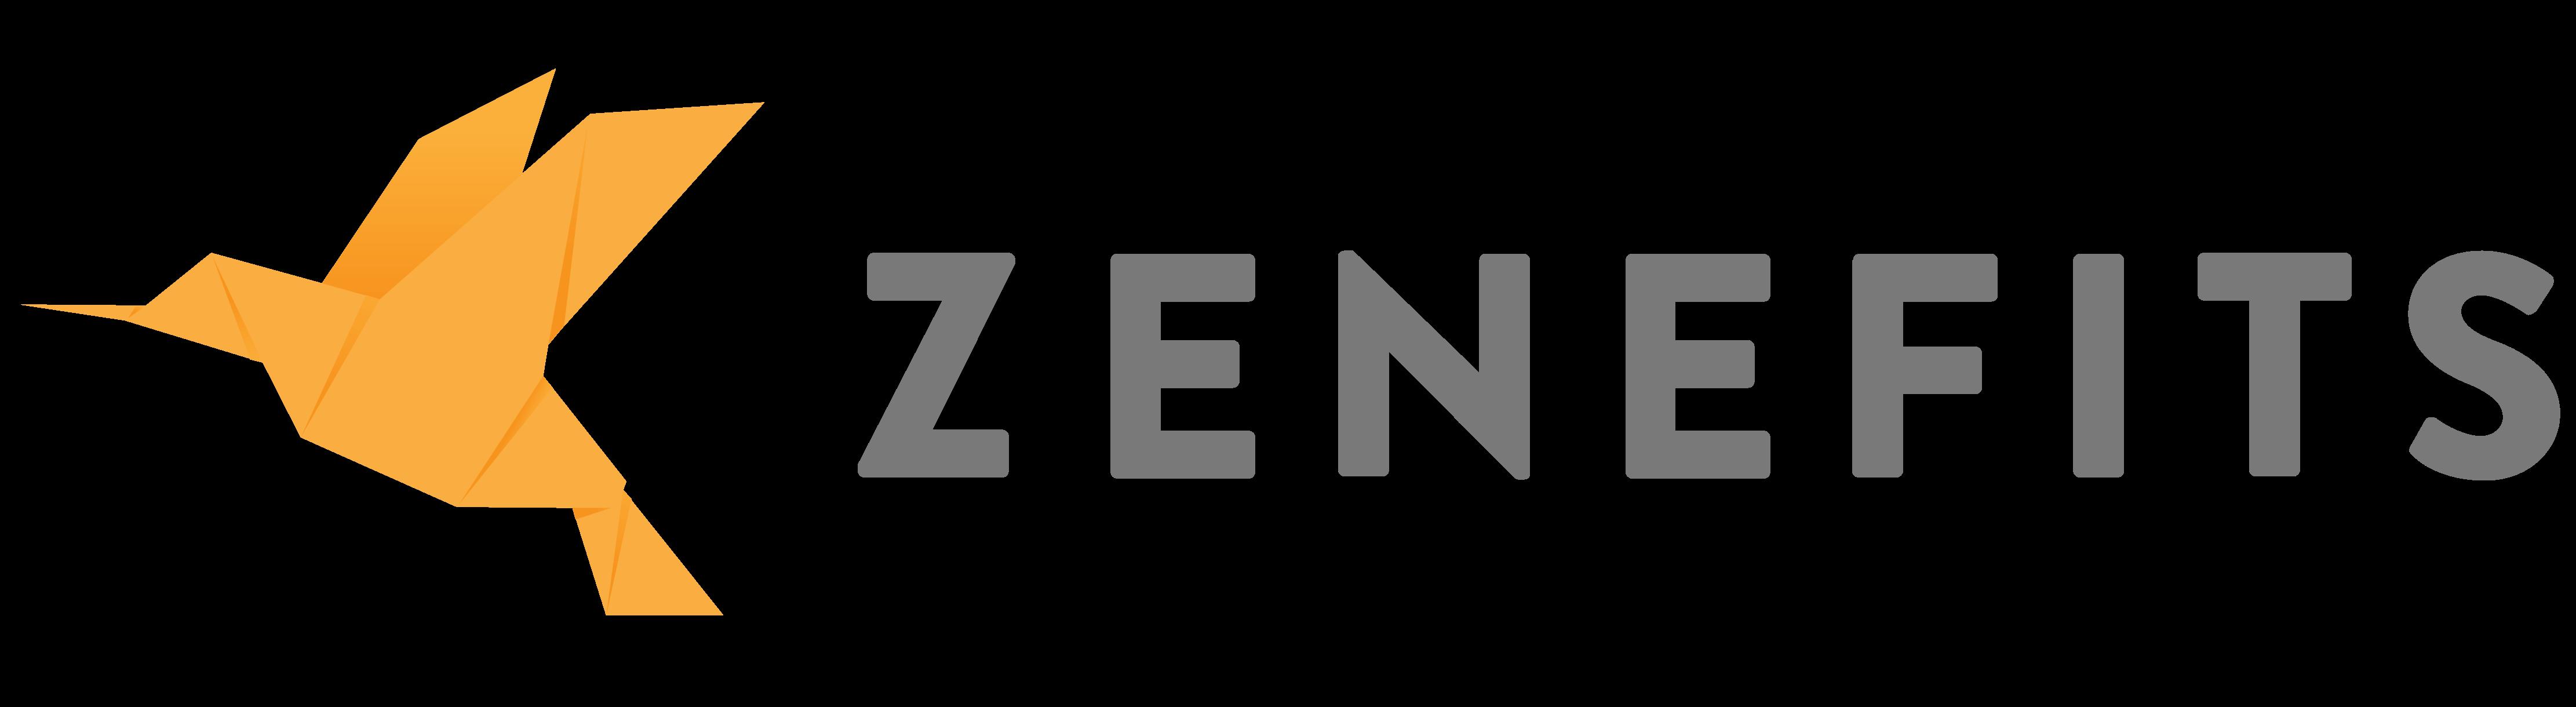 Zenefits.